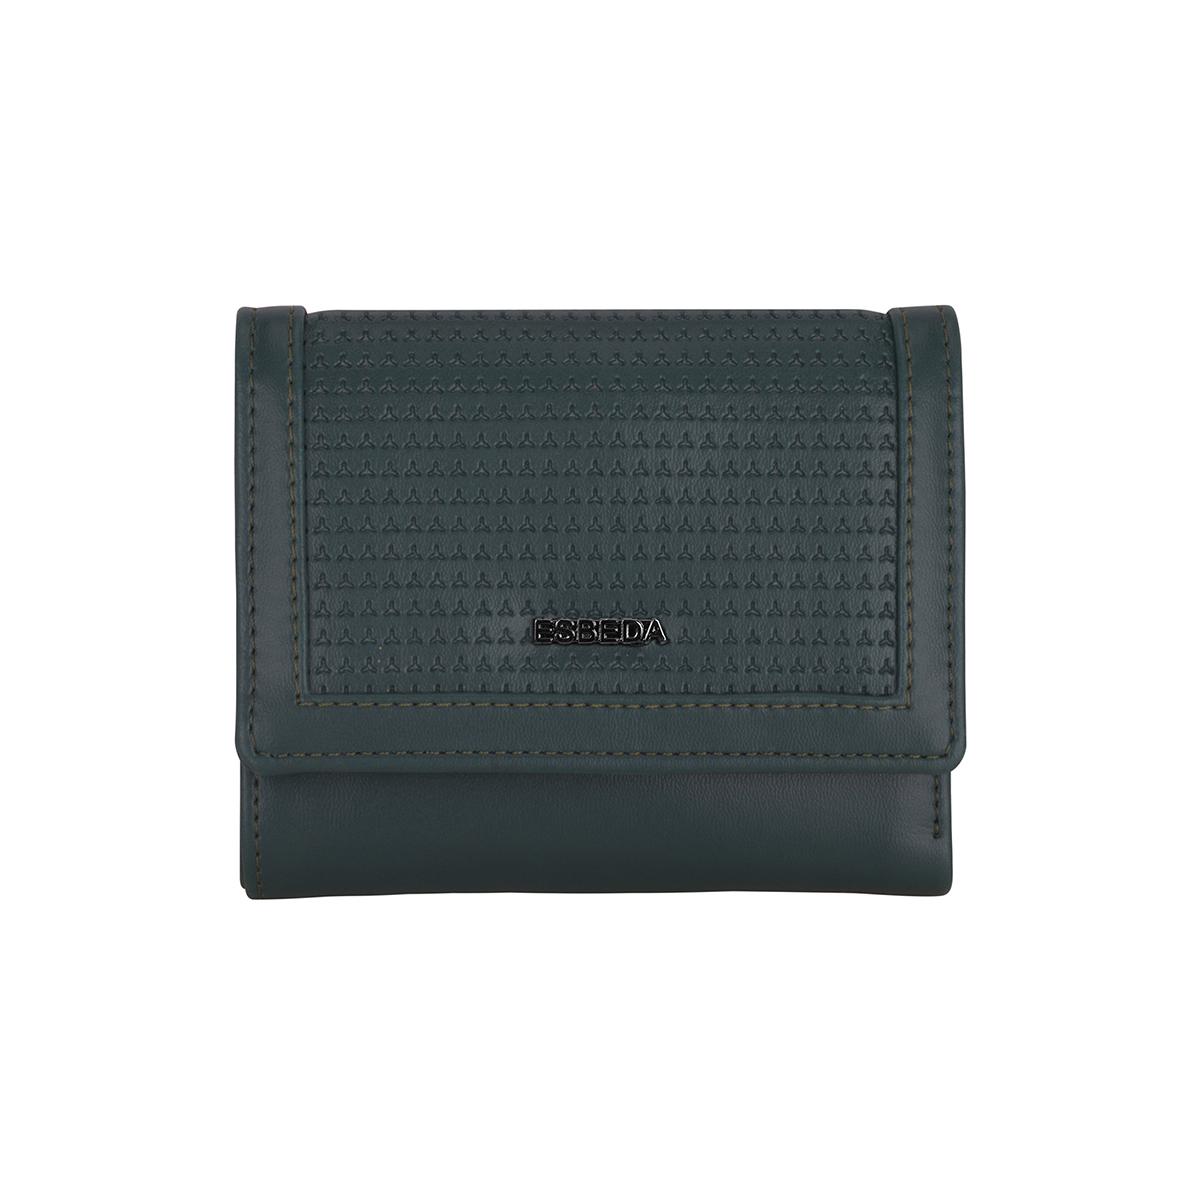 ESBEDA | ESBEDA Green Color Solid Star Emboss Wallet For Women